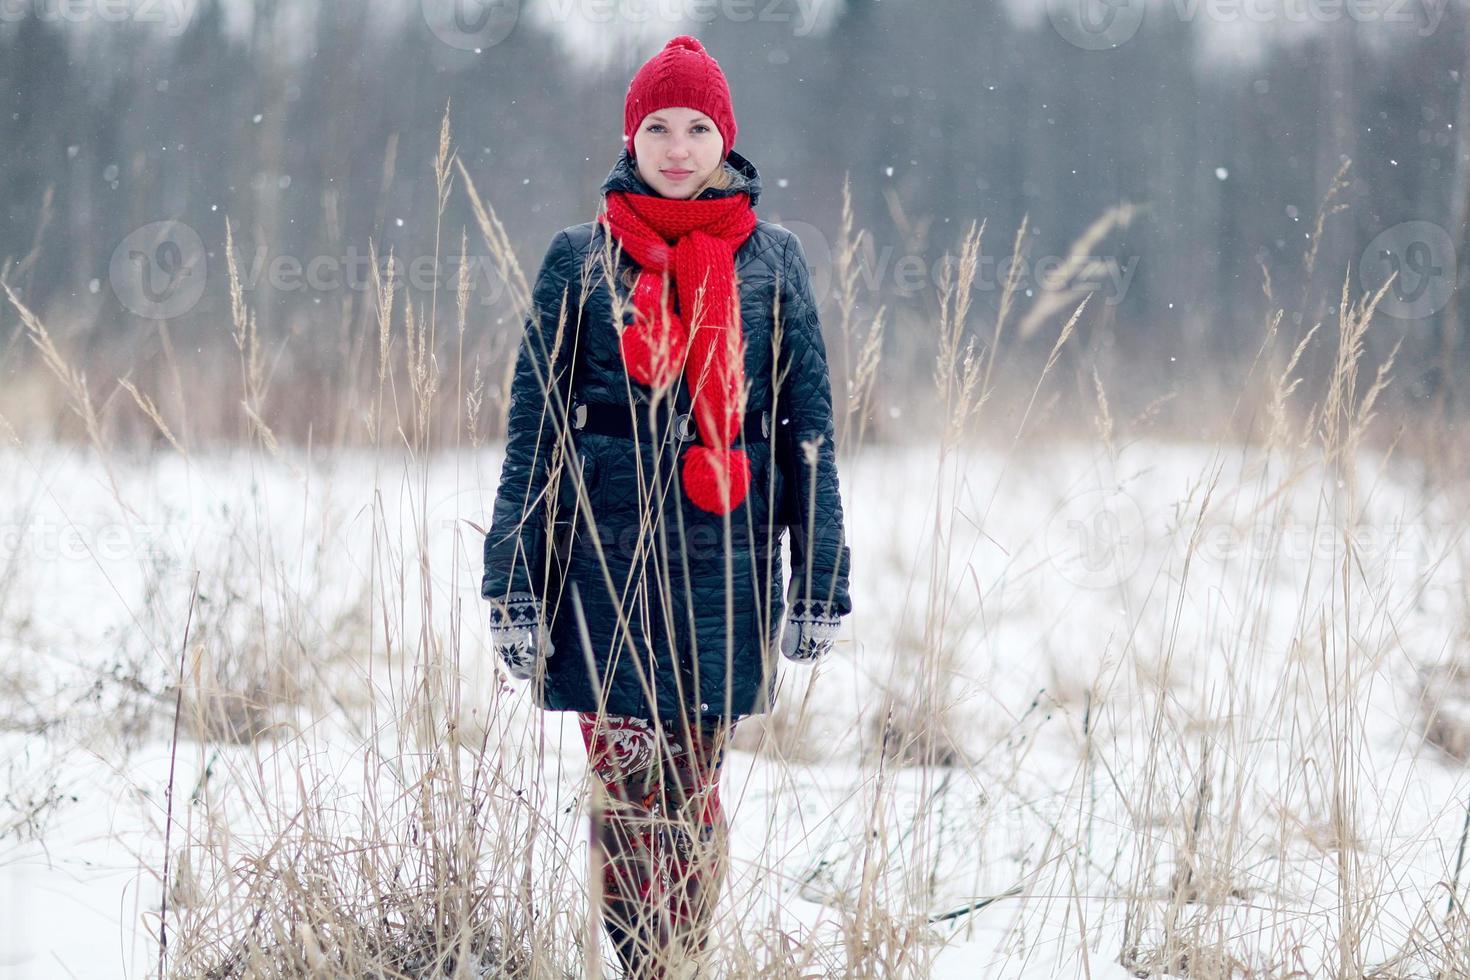 gelukkig meisje wintersneeuw loopt foto